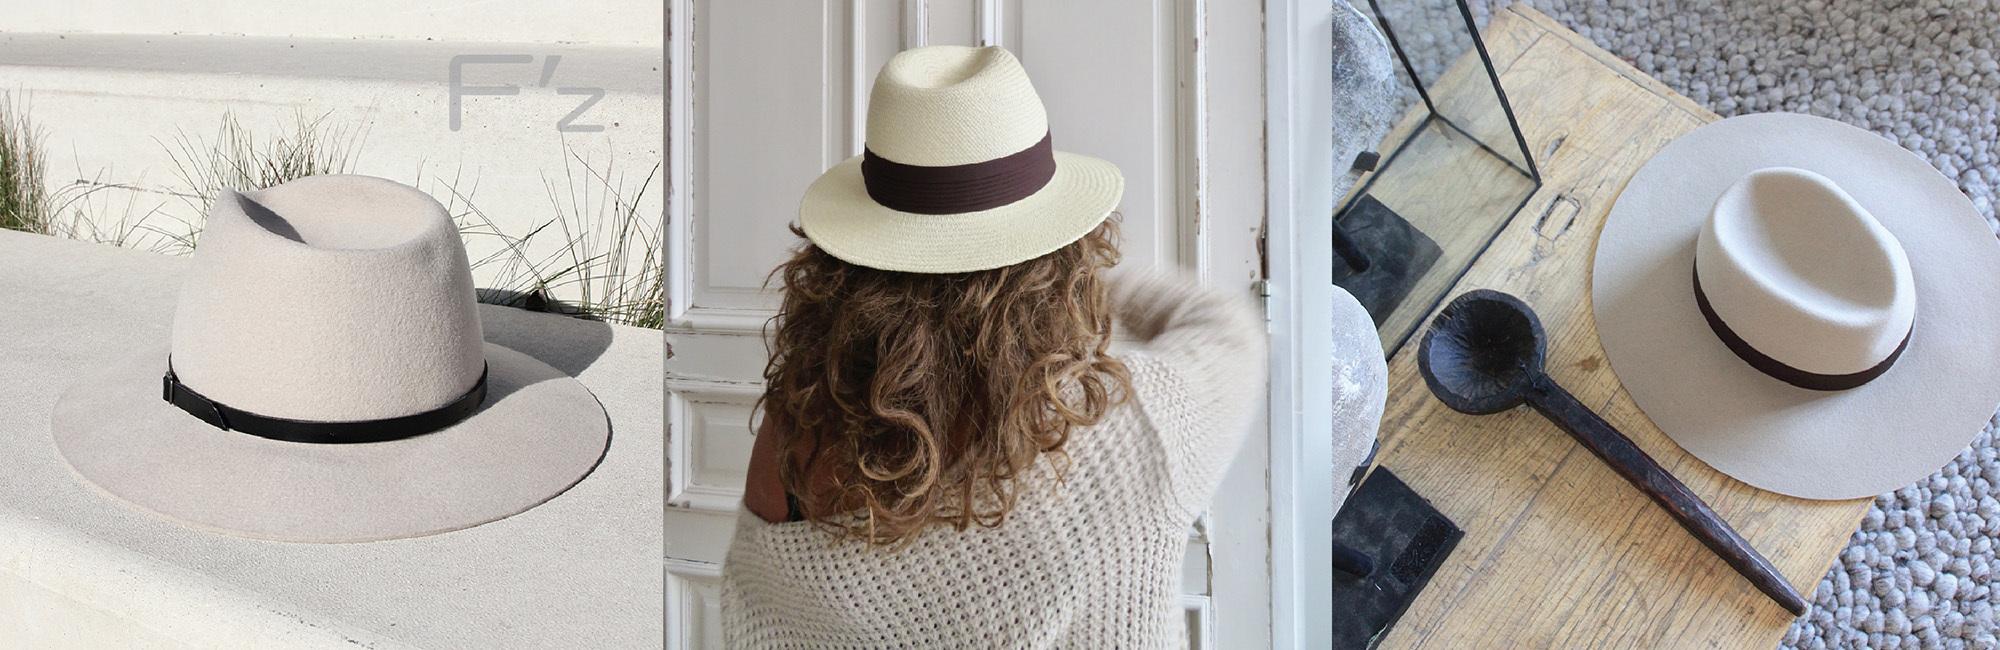 Summer 2020 hoeden hats